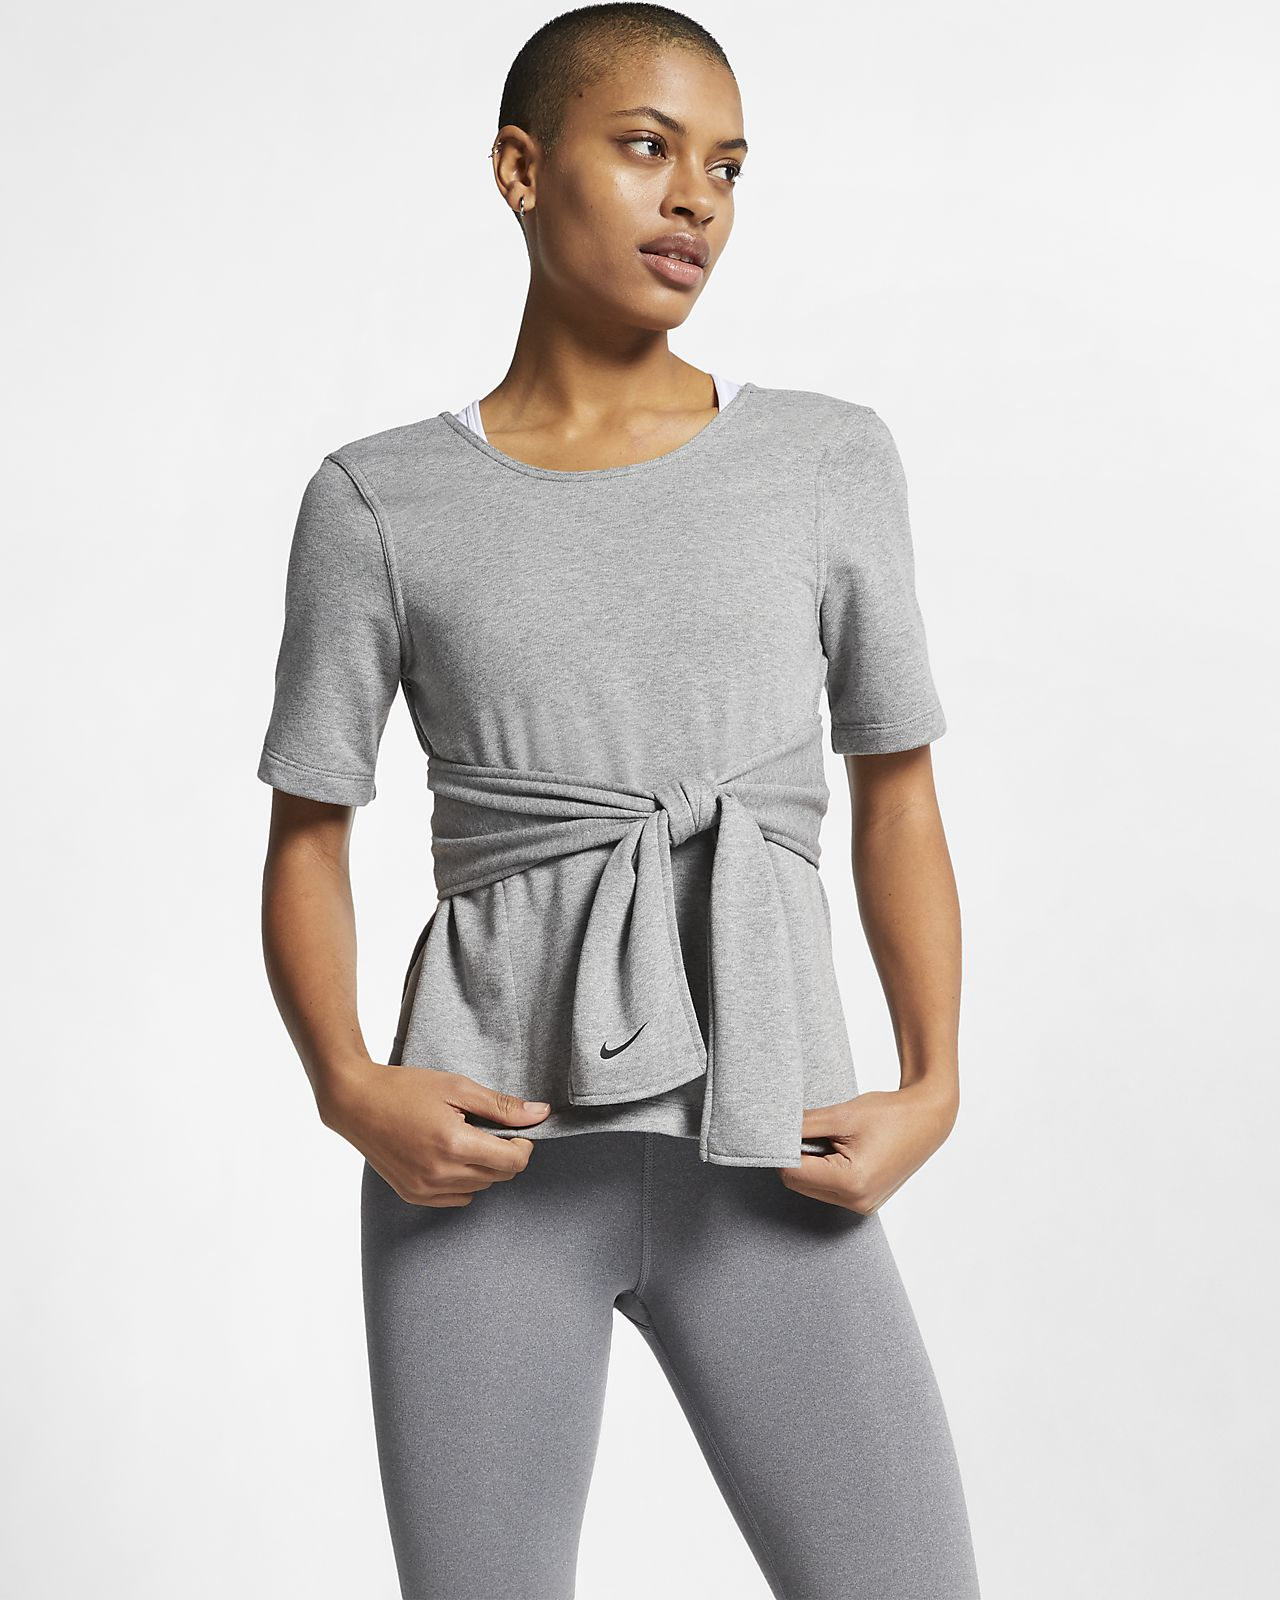 Nike Studio rövid ujjú női edzőfelső jógához